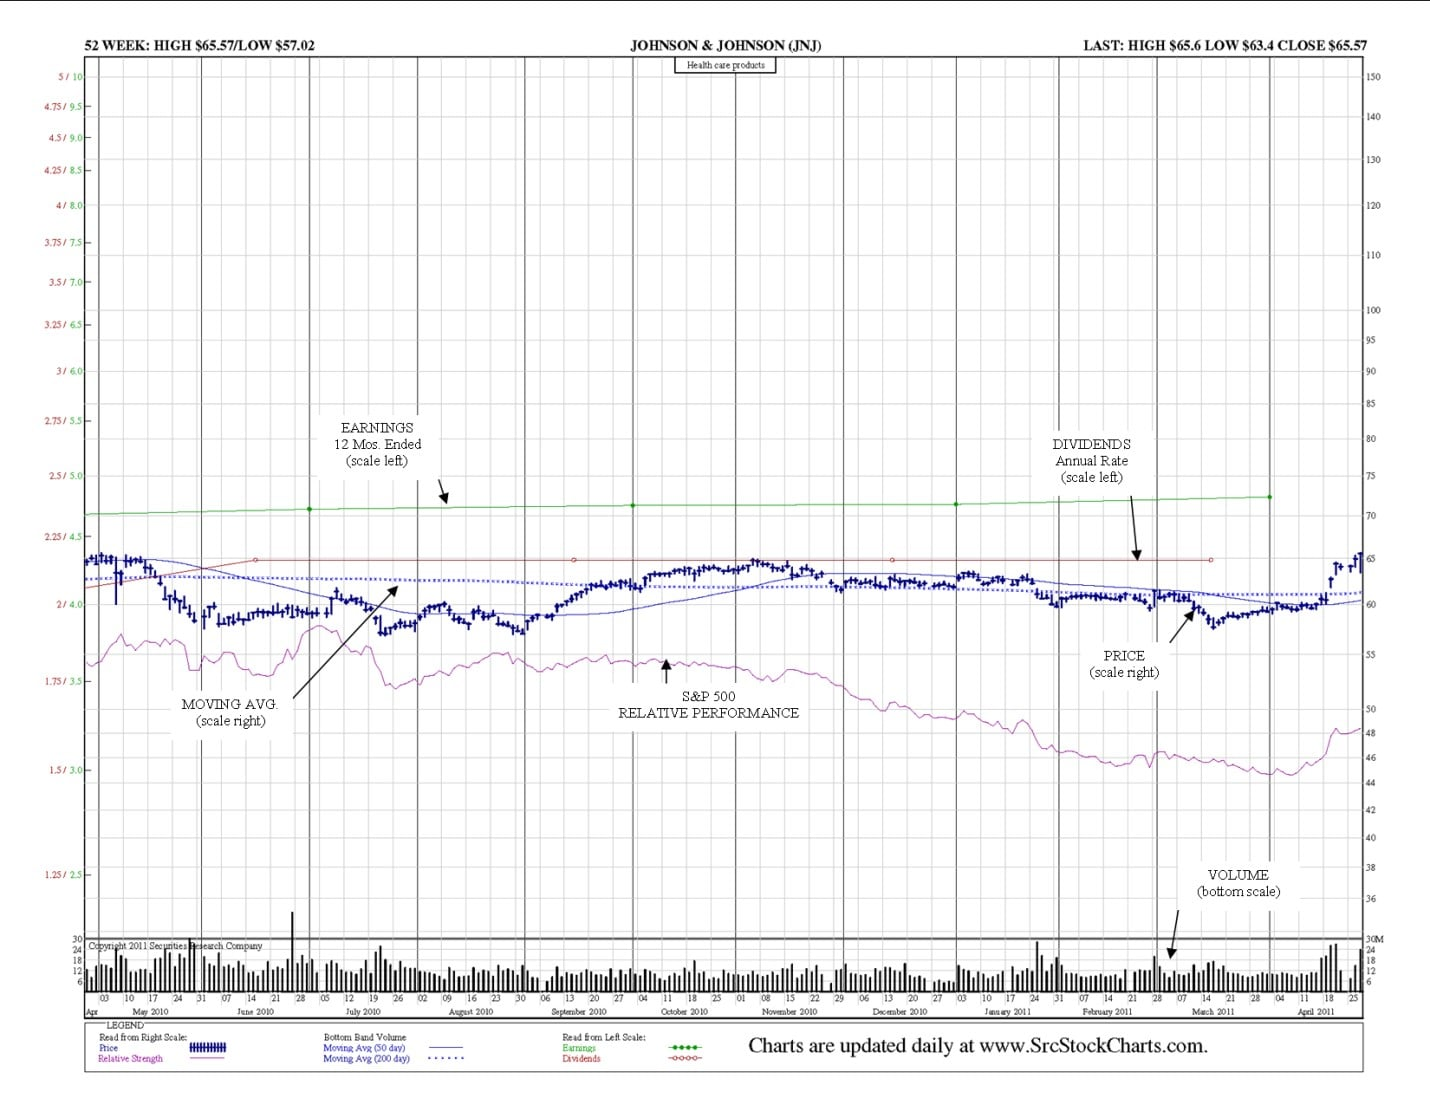 jnj-daily-chart